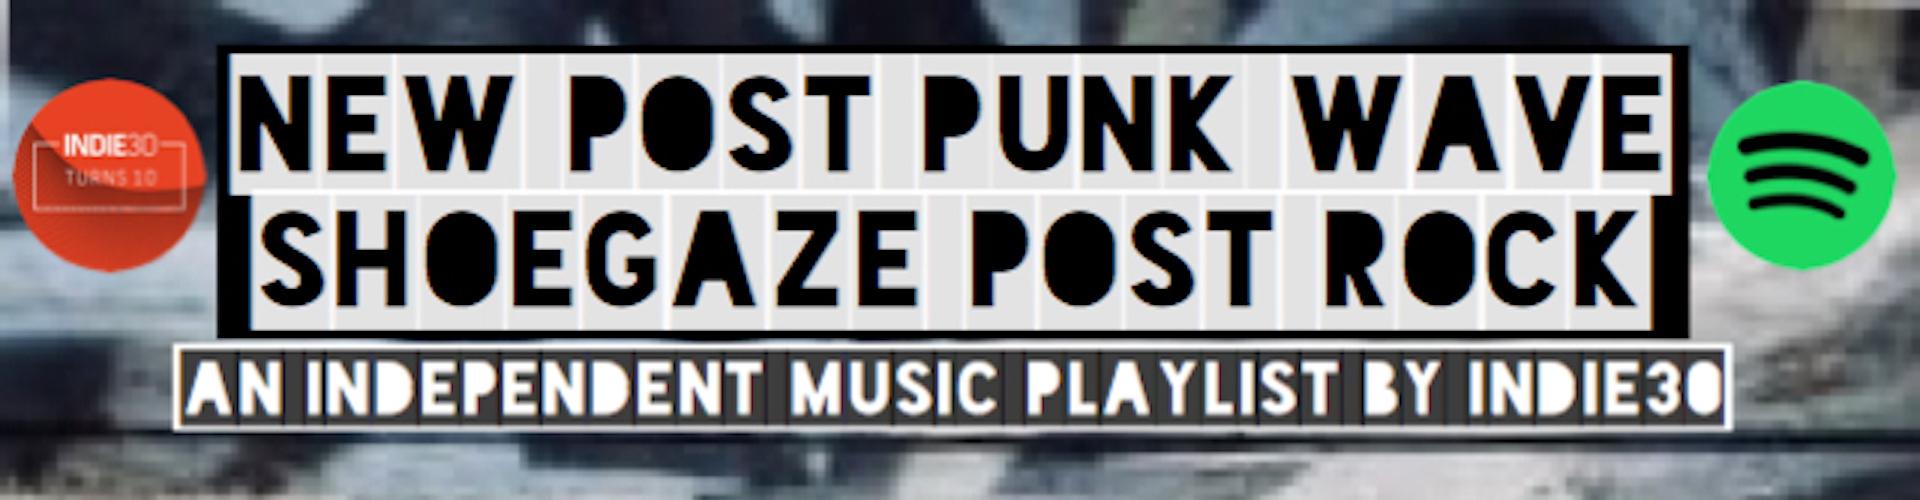 New-Post-Punk-Wave-Shoegaze-Post-Rock-9-Banner-1